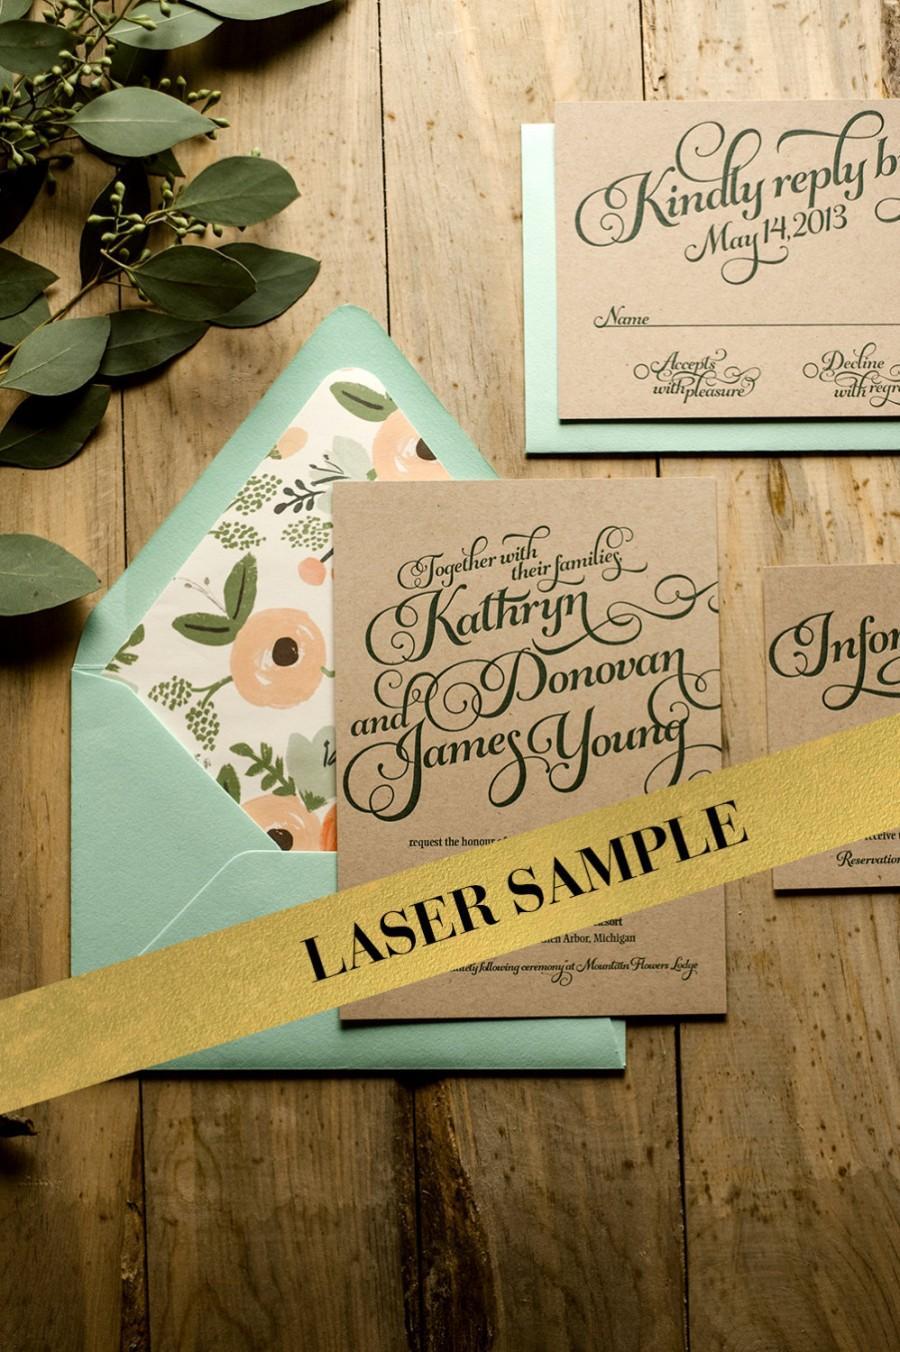 Wedding - Rustic Wedding Invitation, Mint & Kraft Wedding Invite, Rustic Wedding Invite, Calligraphy Invitation - LASER PRINTED Sample Set